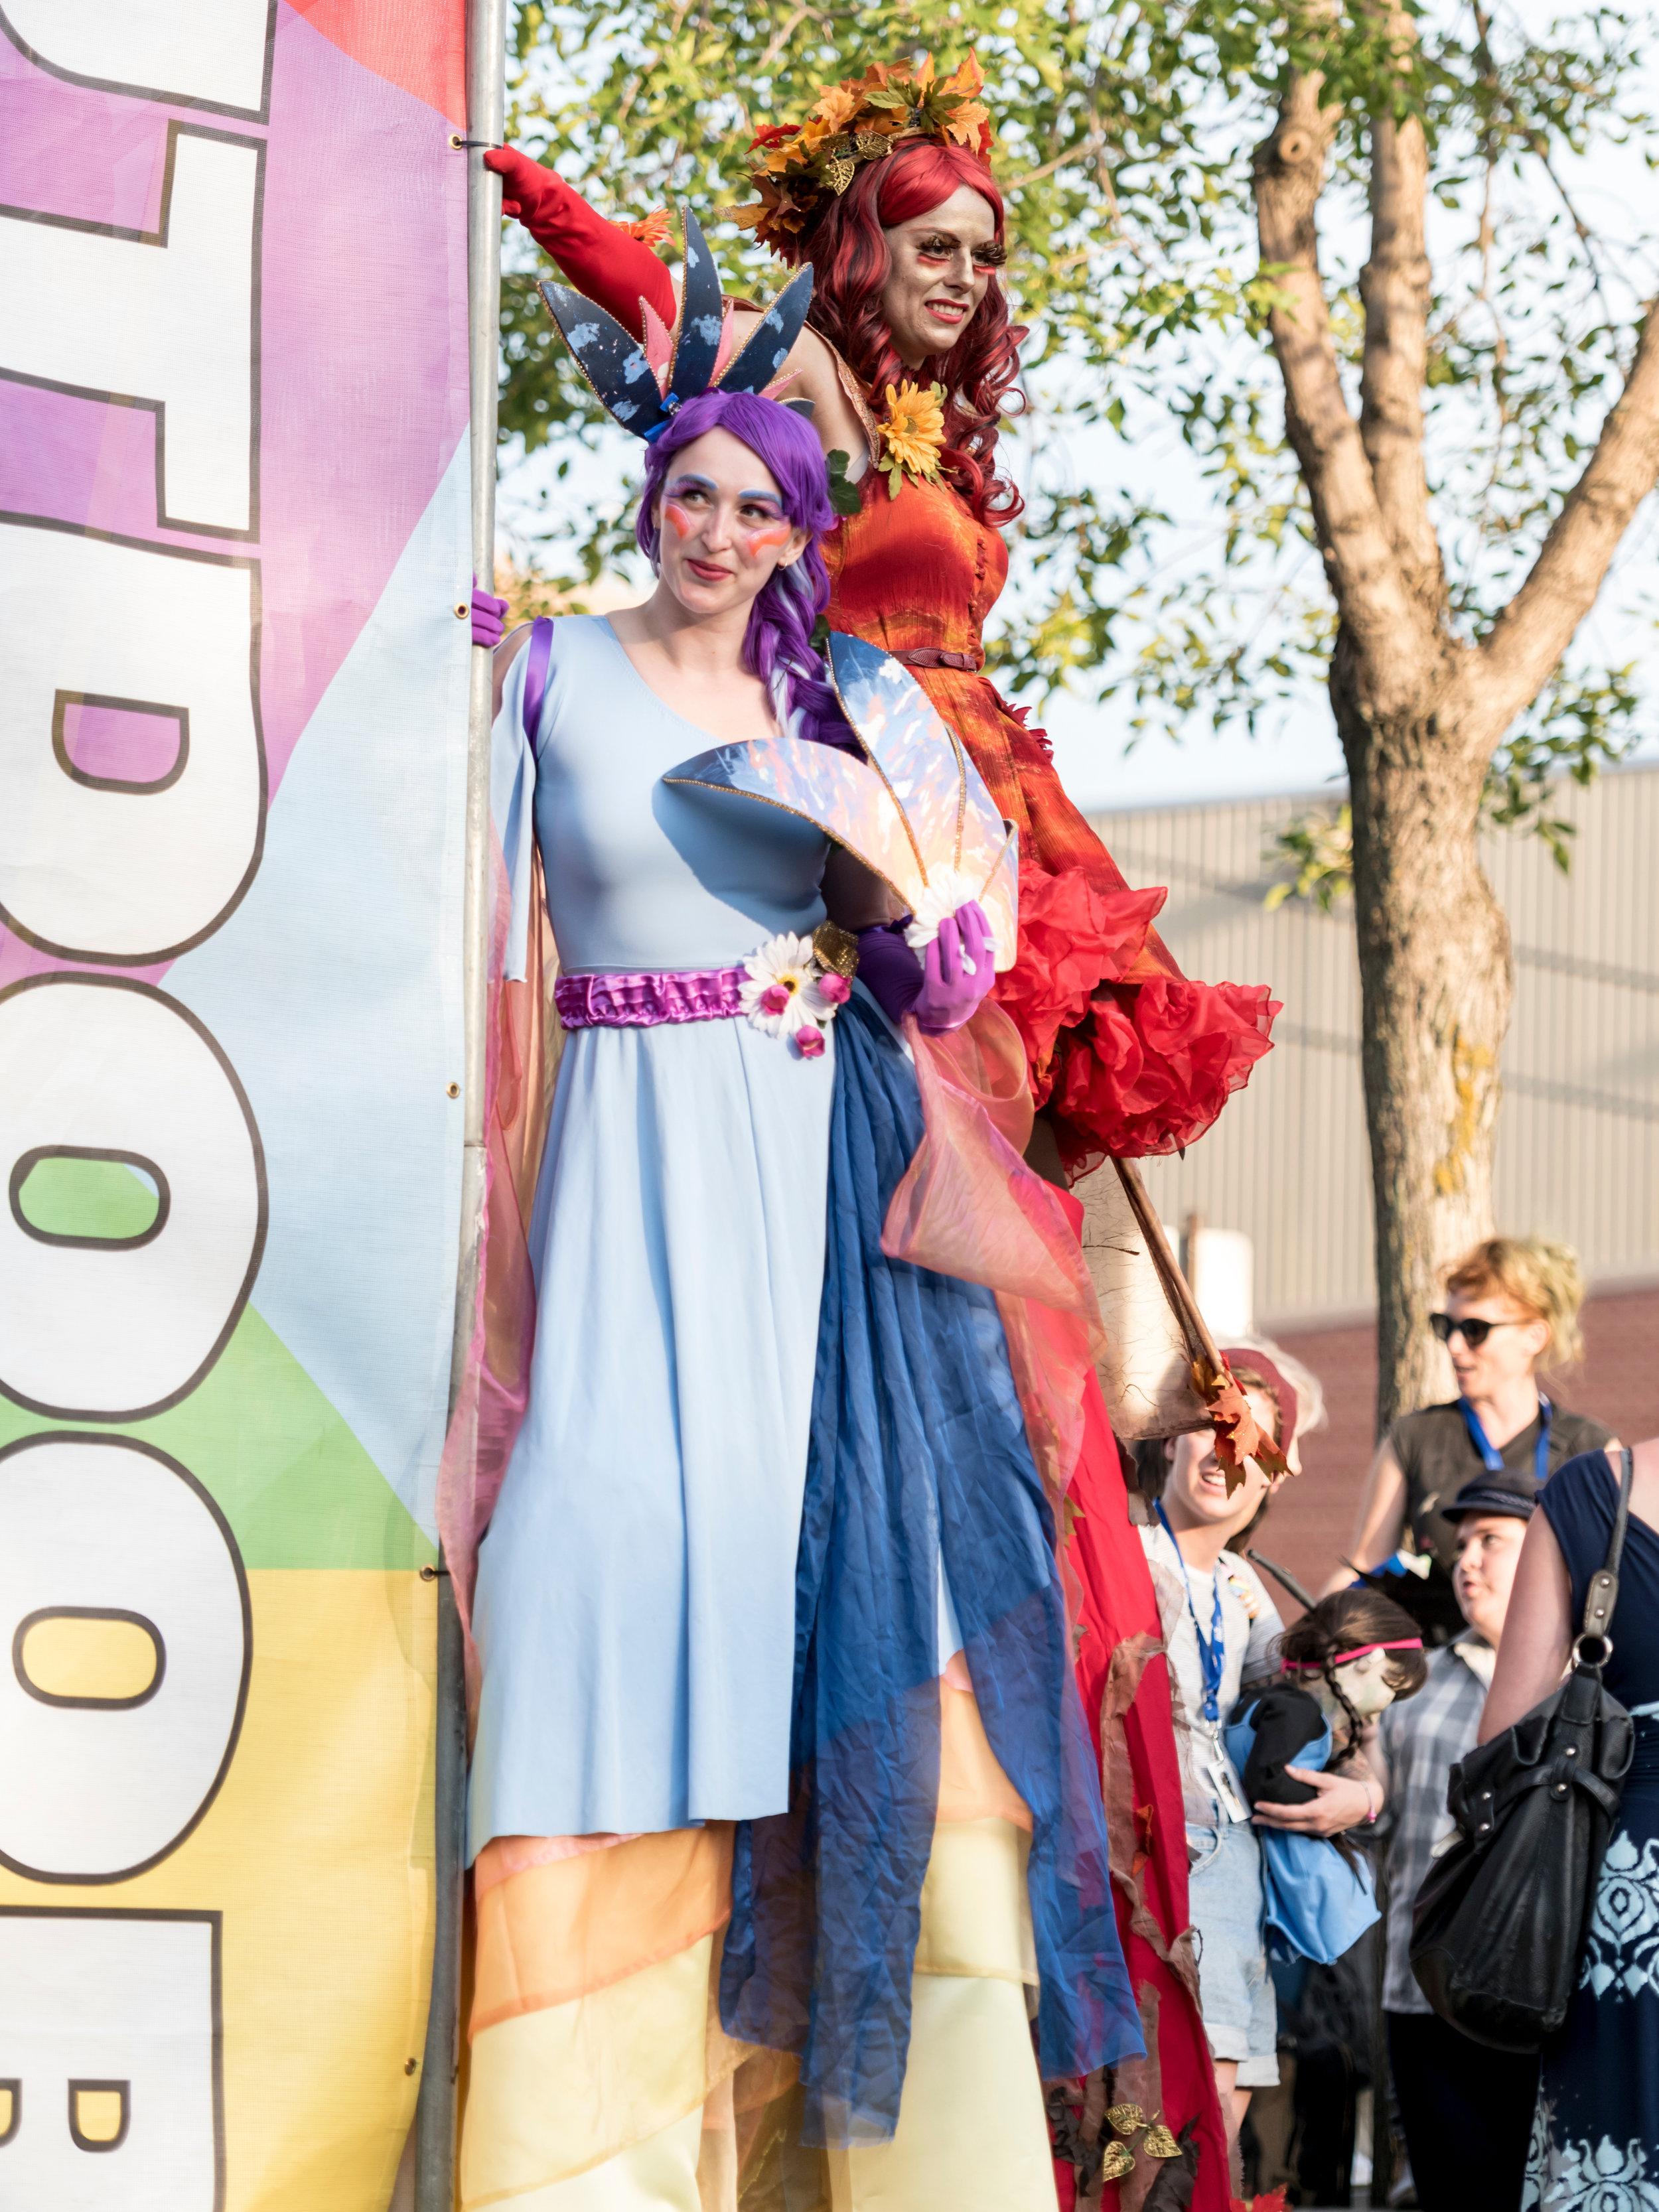 Summer and Autumn Fairies - Edmonton Fringe Opening Ceremonies Photo by Nancy Price